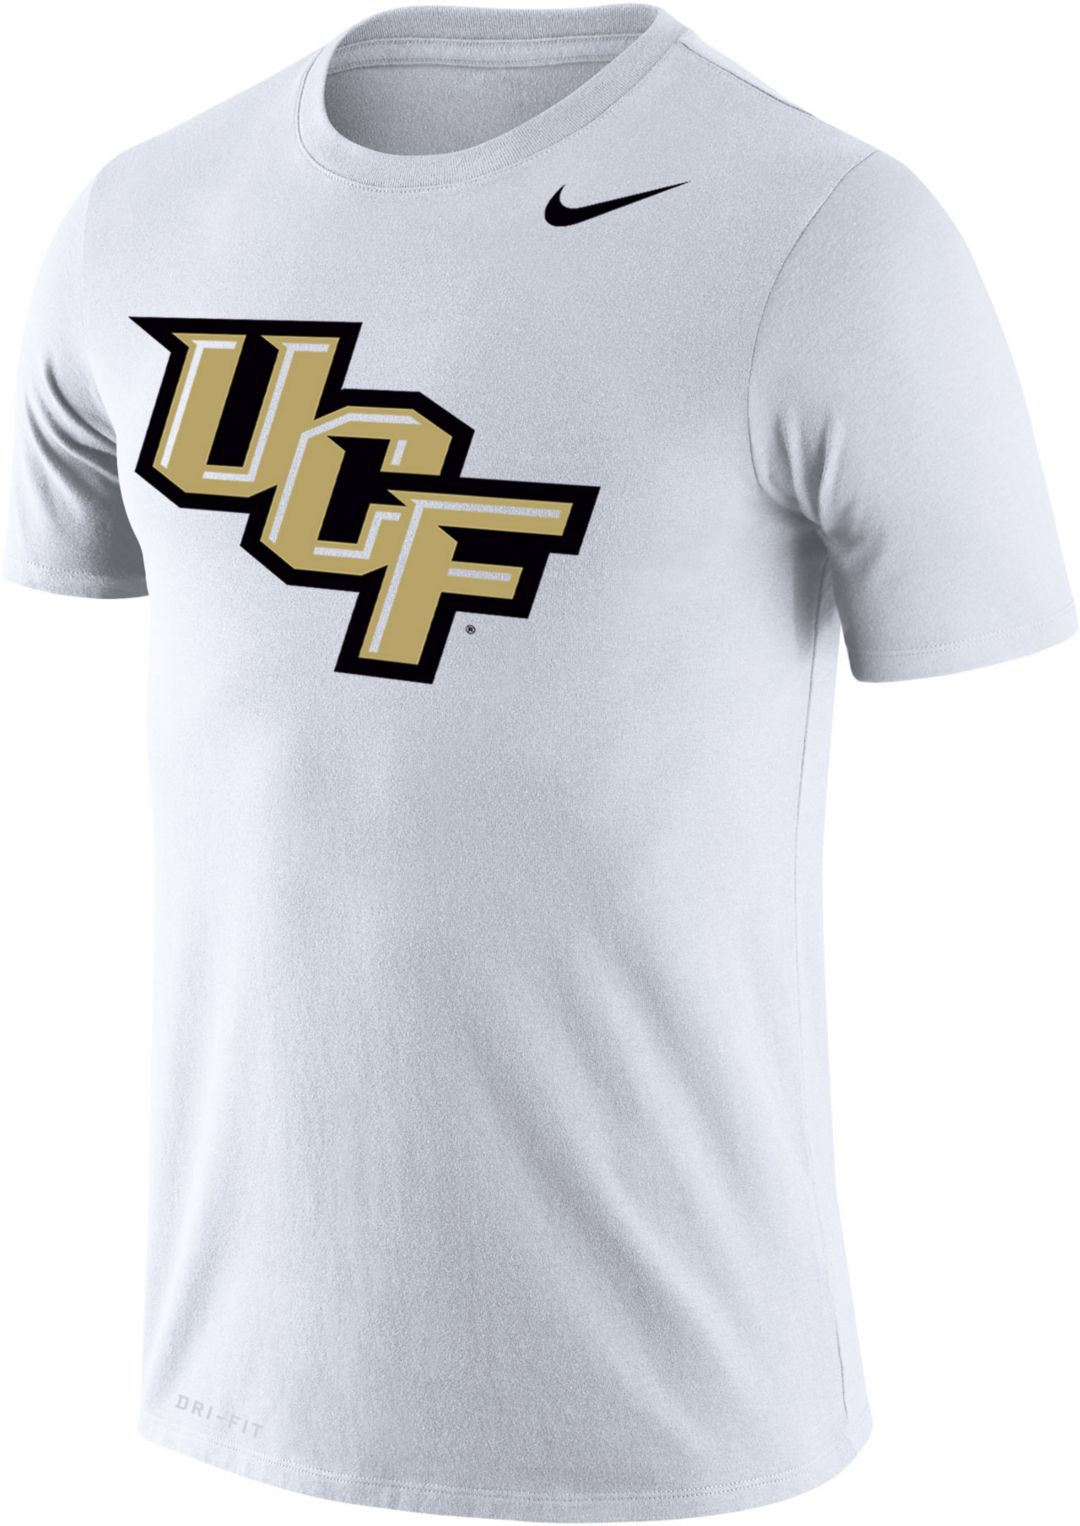 buy online b89f9 d182a Nike Men's UCF Logo Dry Legend White T-Shirt